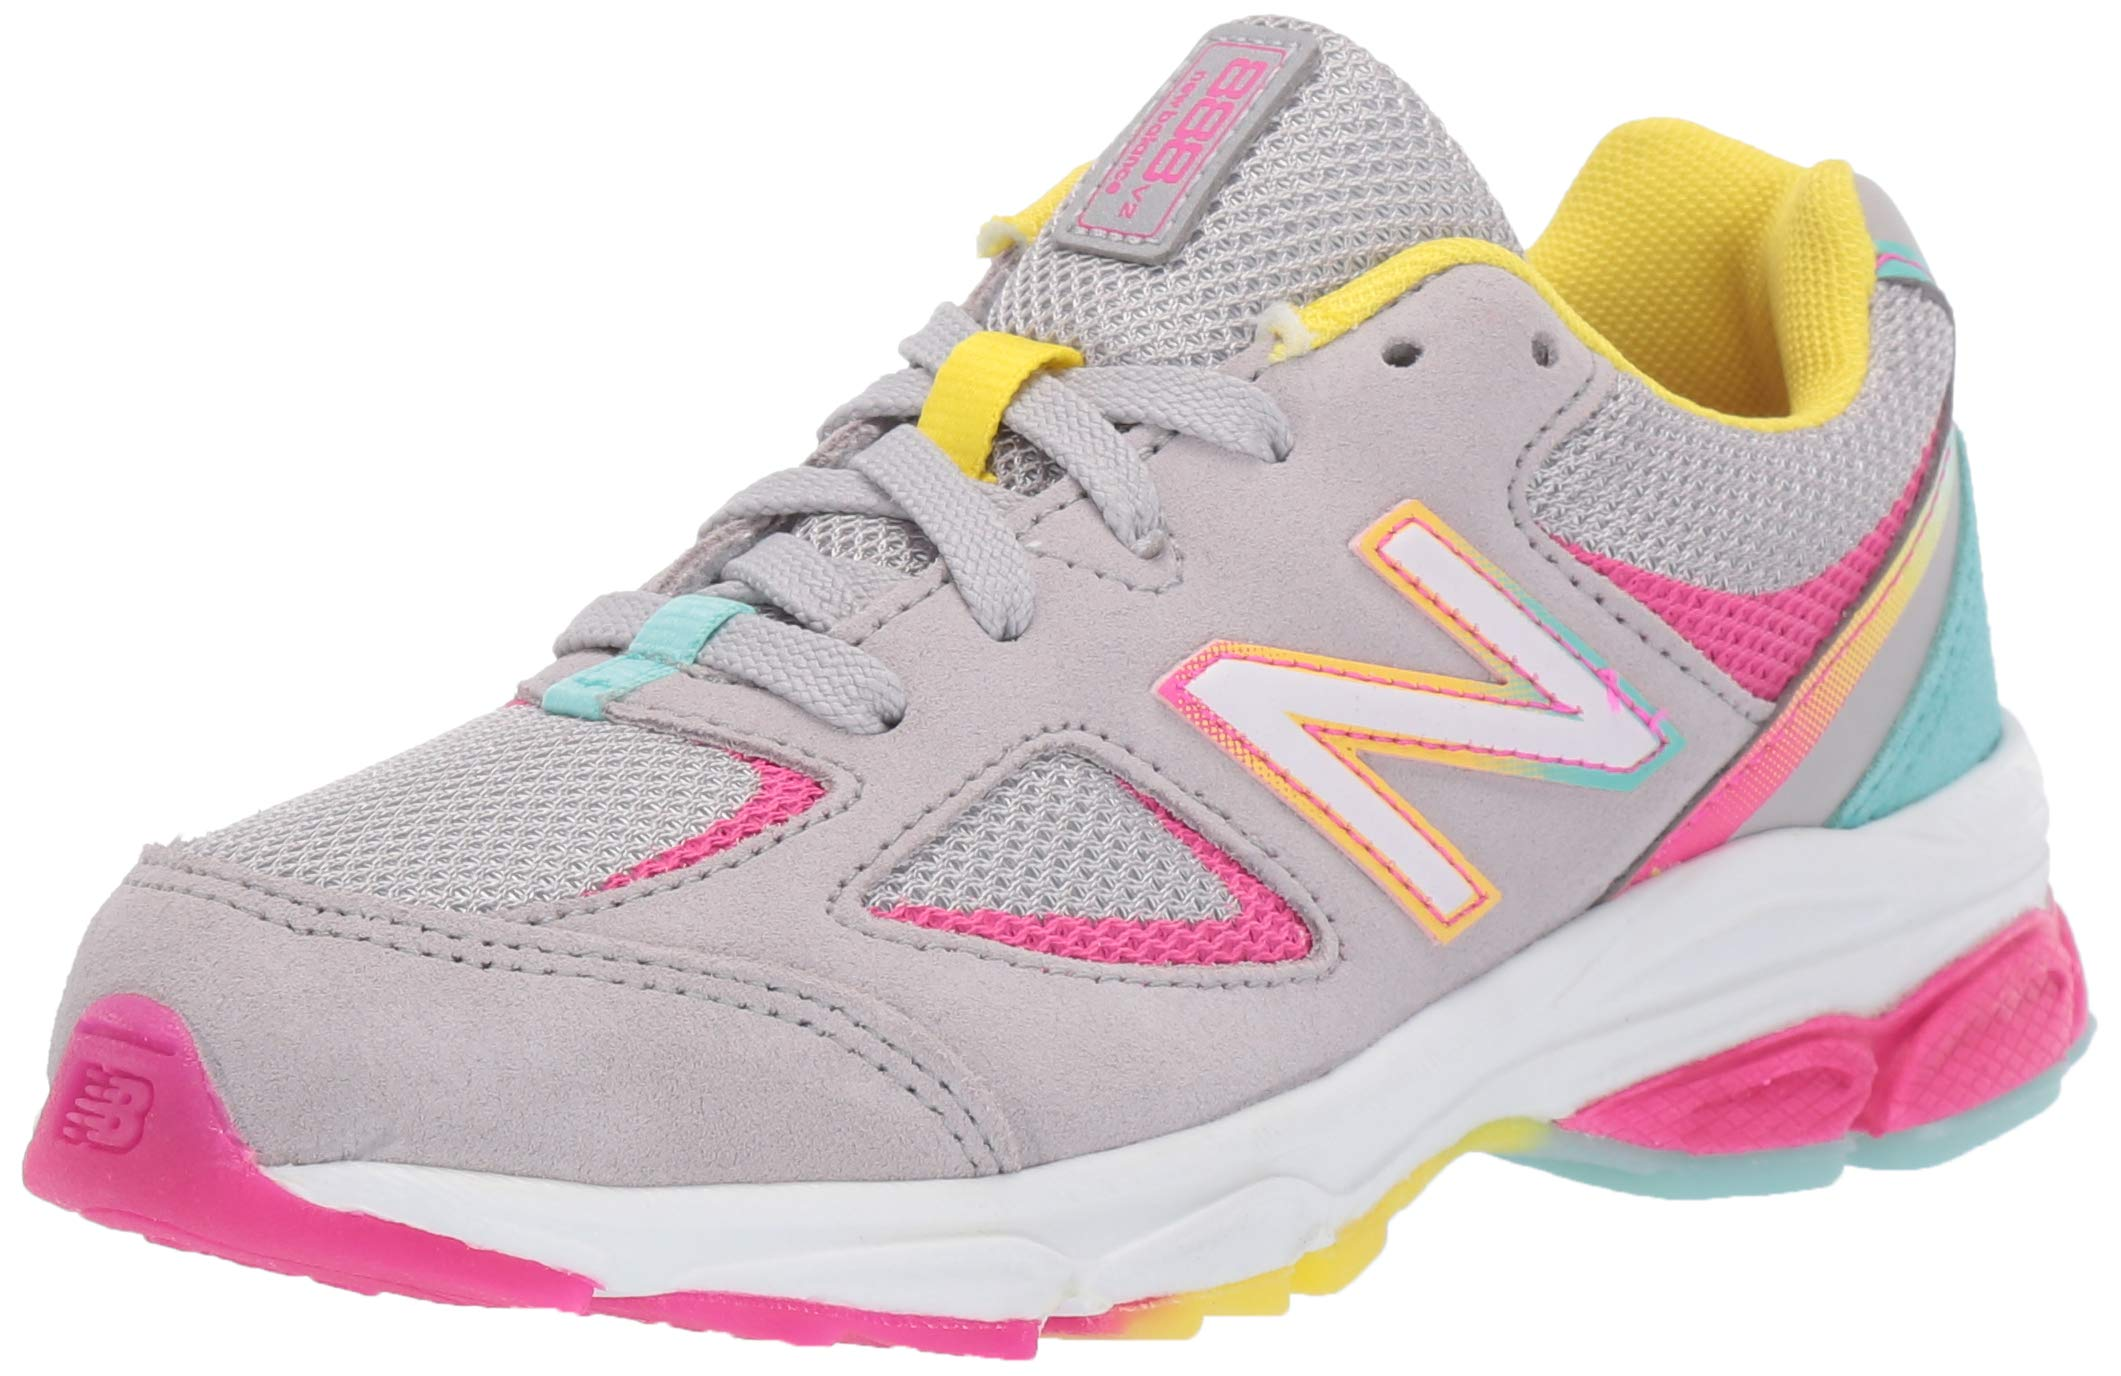 New Balance Girls' 888v2 Running Shoe, Grey/Rainbow, 1 W US Little Kid